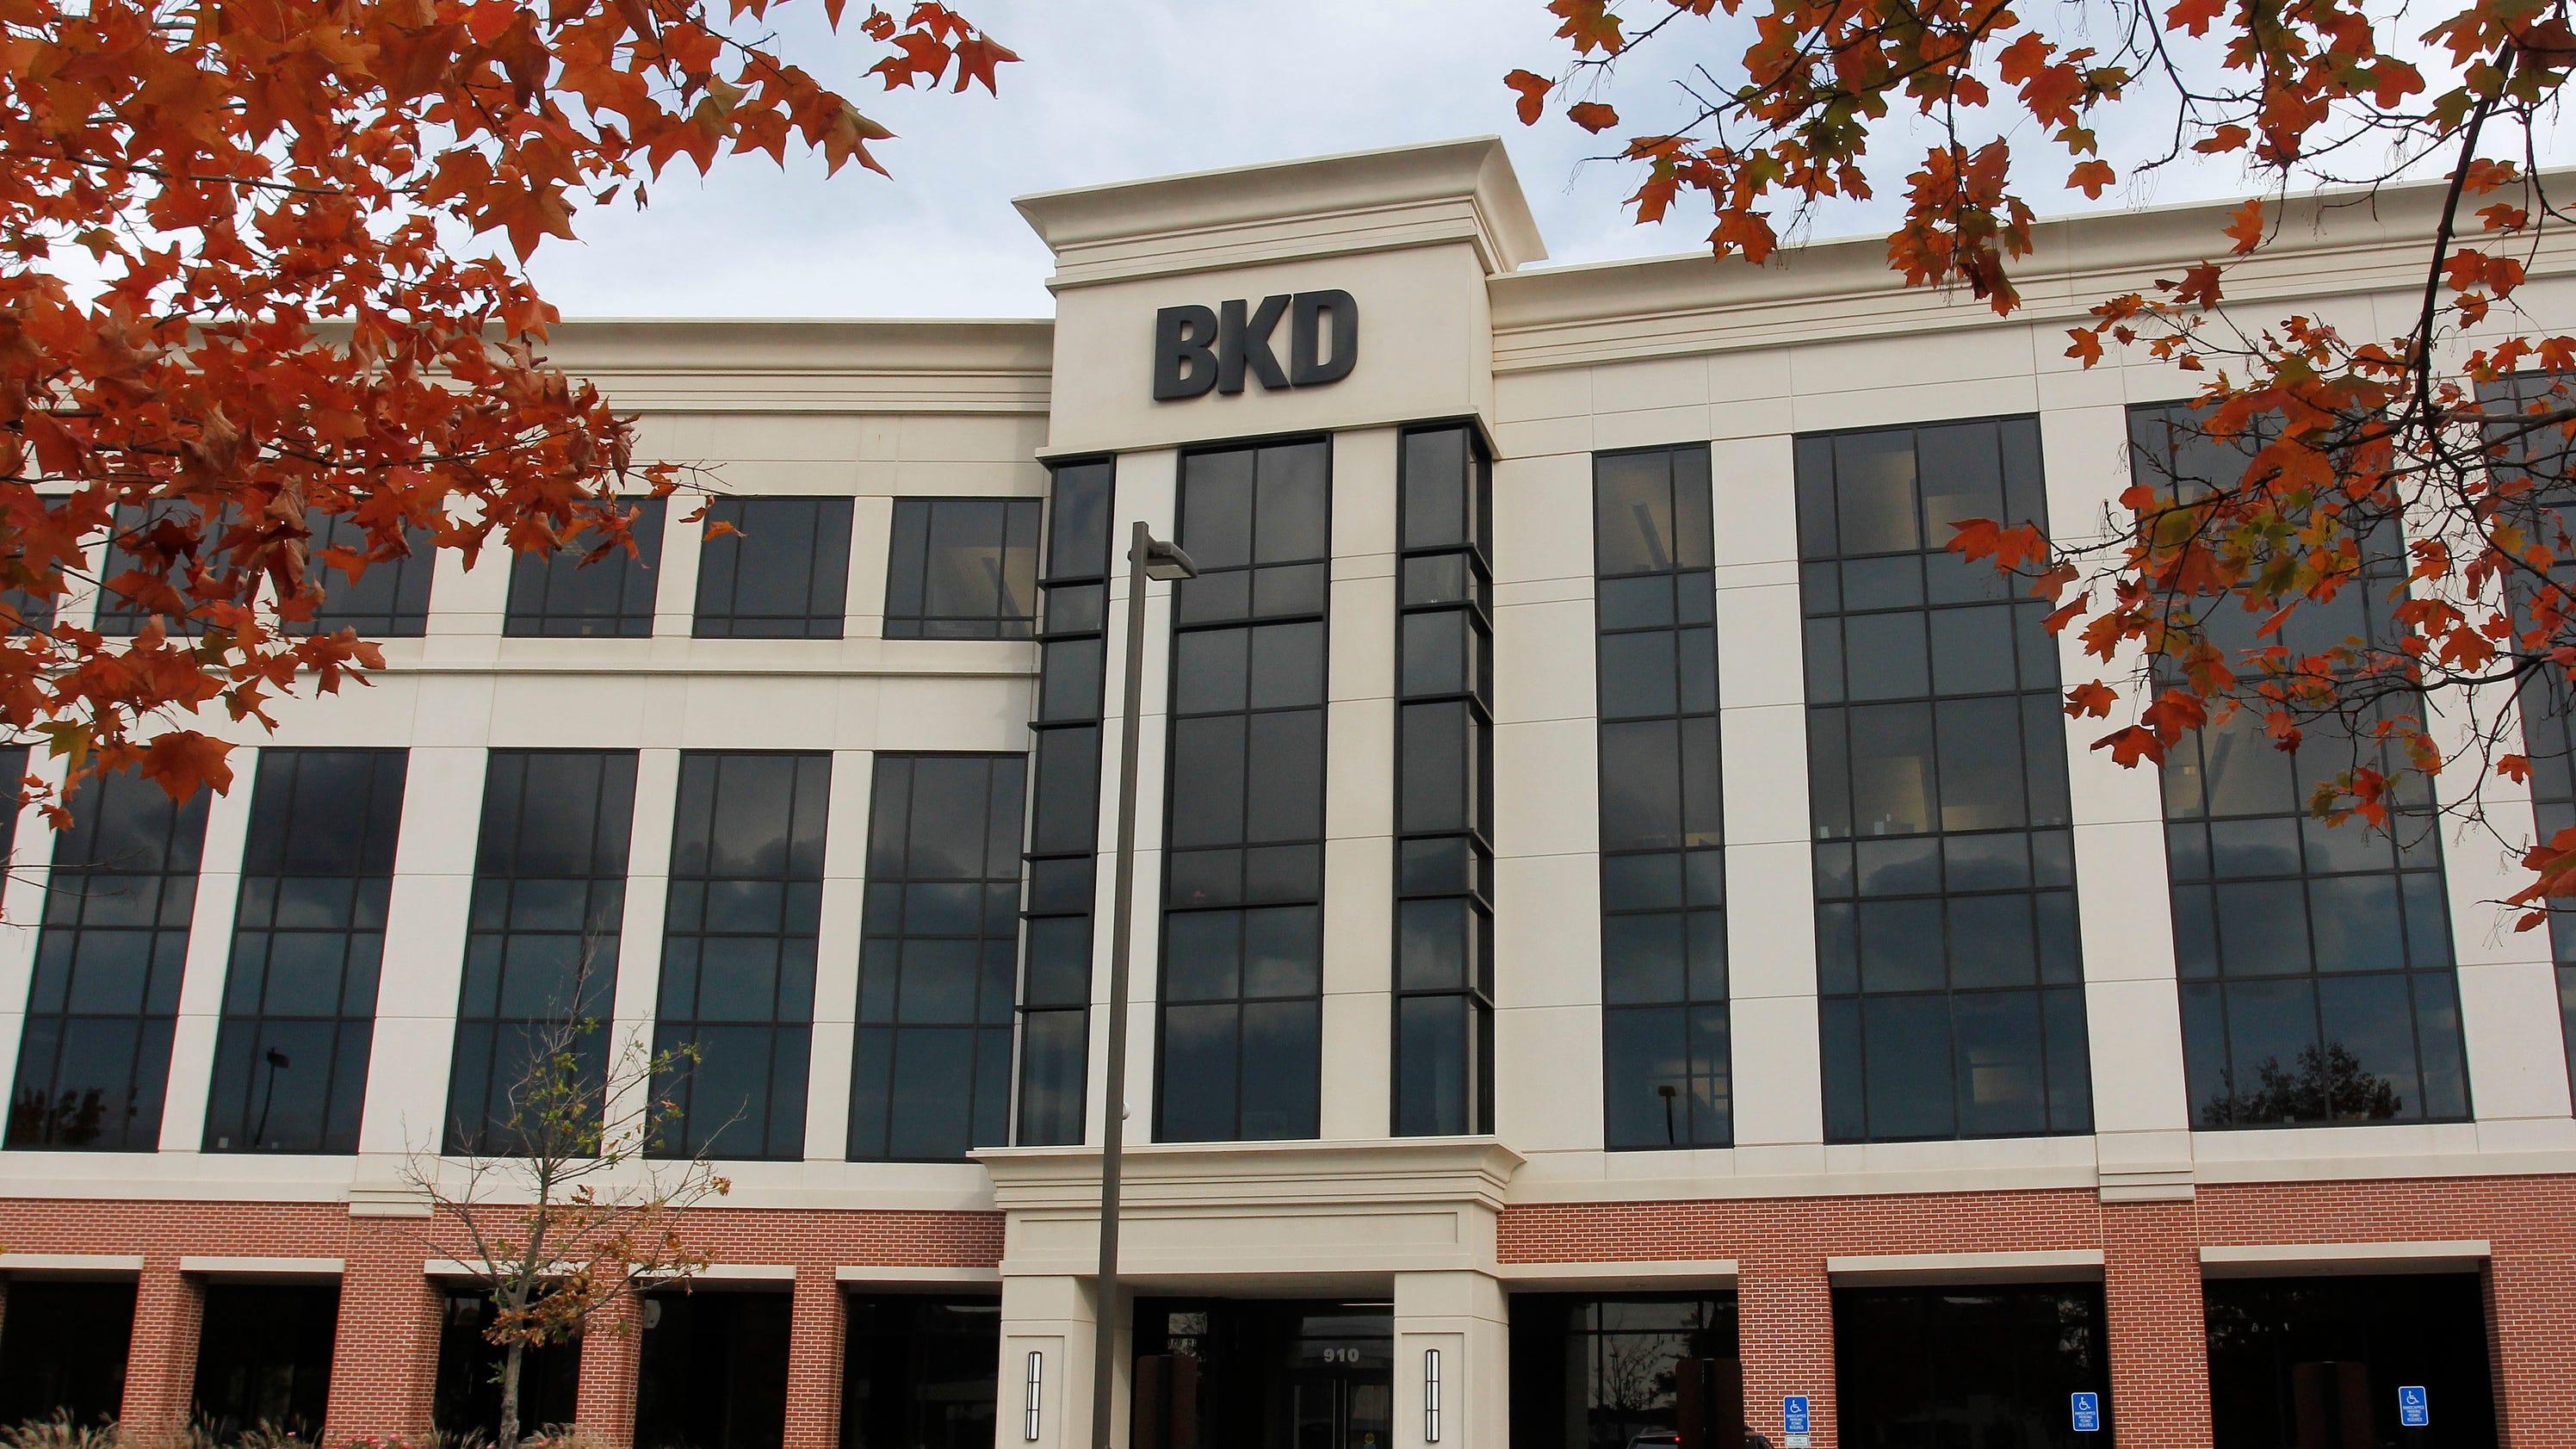 Ozarks Business Titans BKD